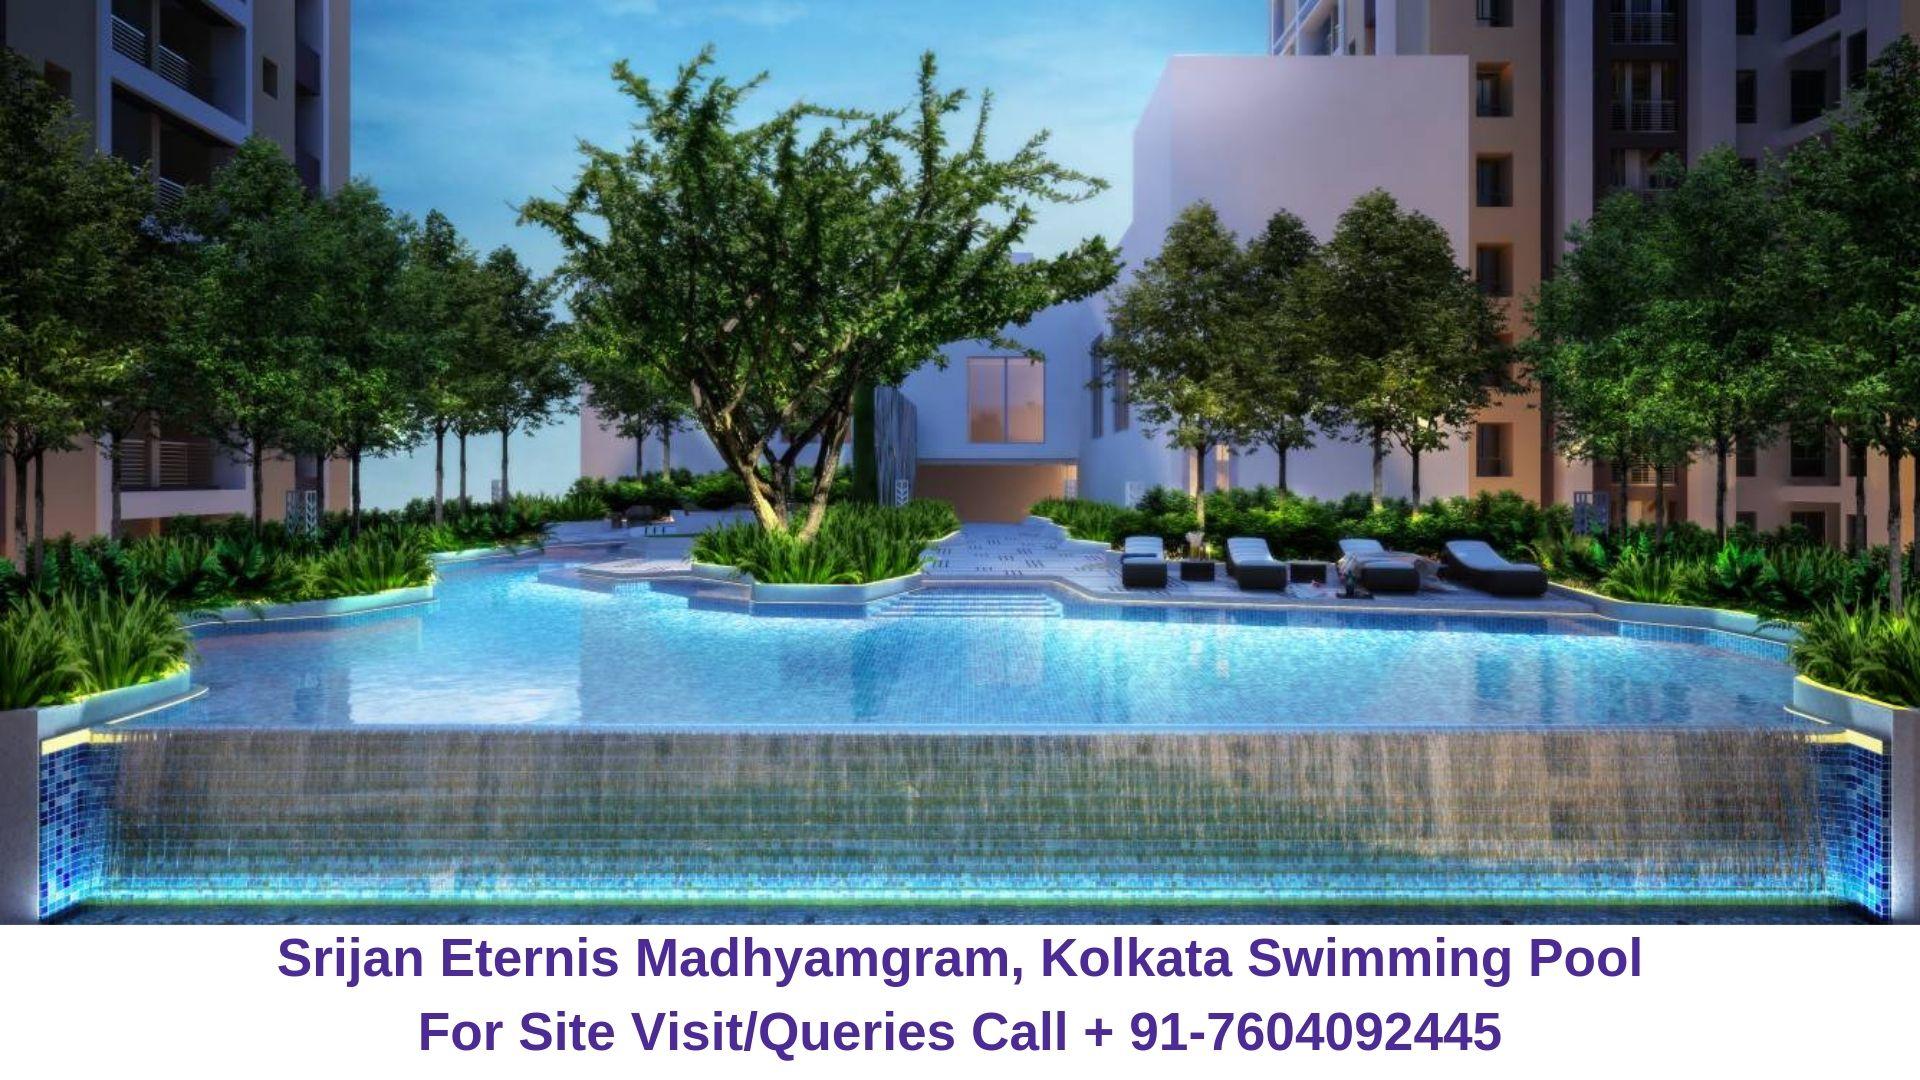 Srijan Eternis Madhyamgram, Kolkata Swimming Pool